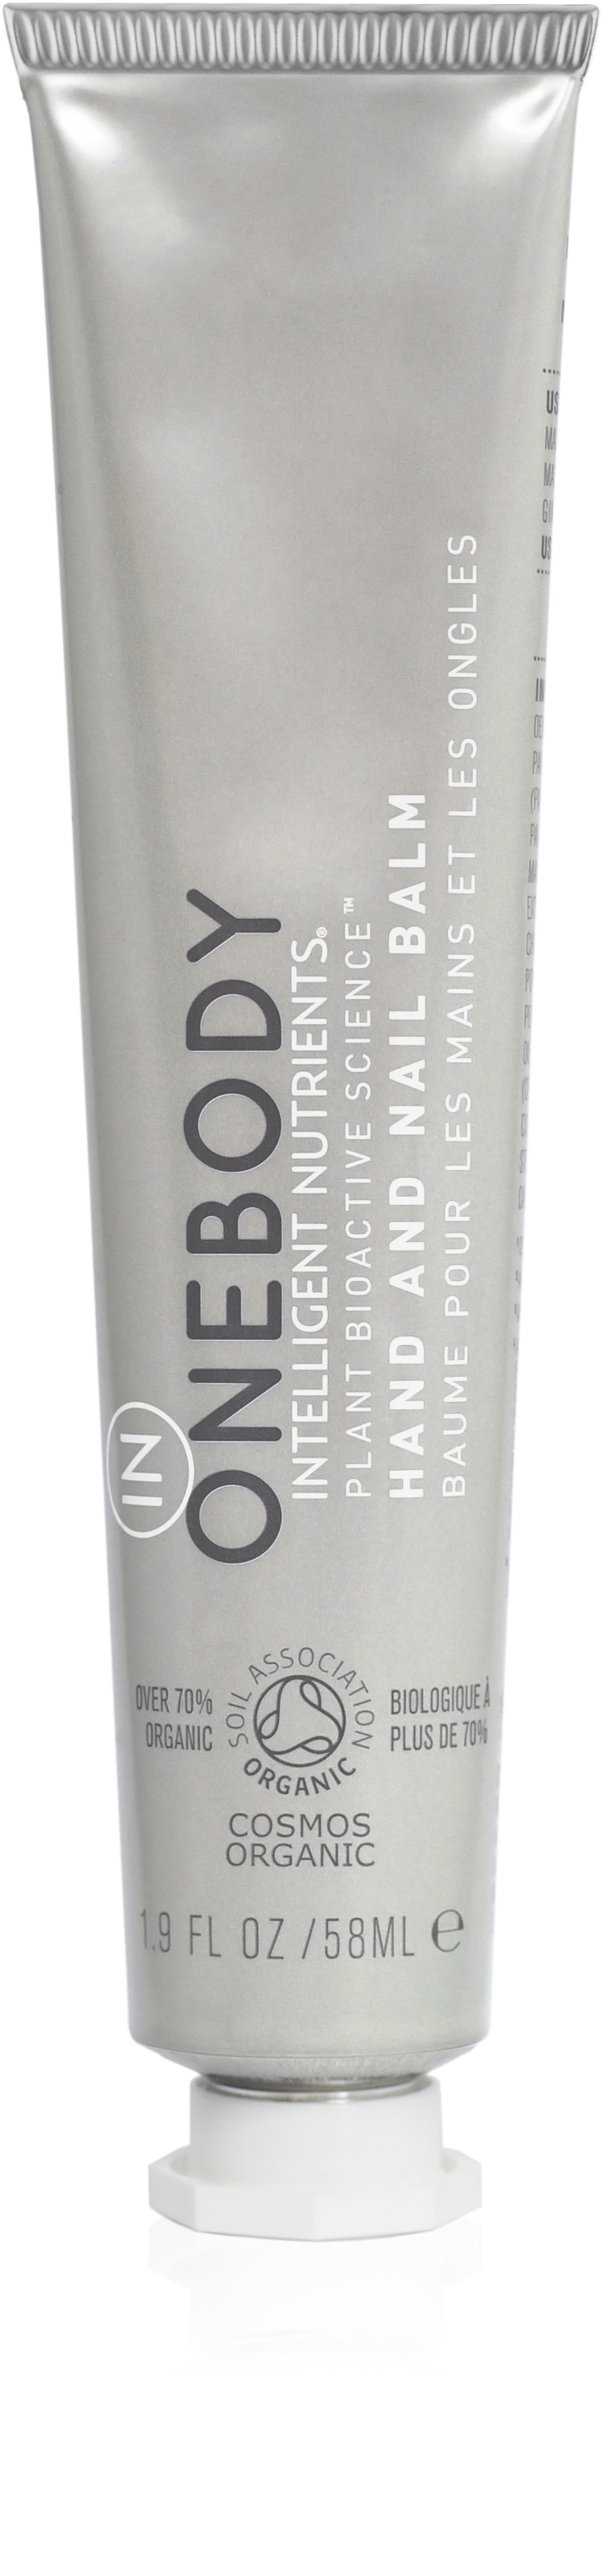 Onebody Hand & Nail Balm (DKK245/58ml)